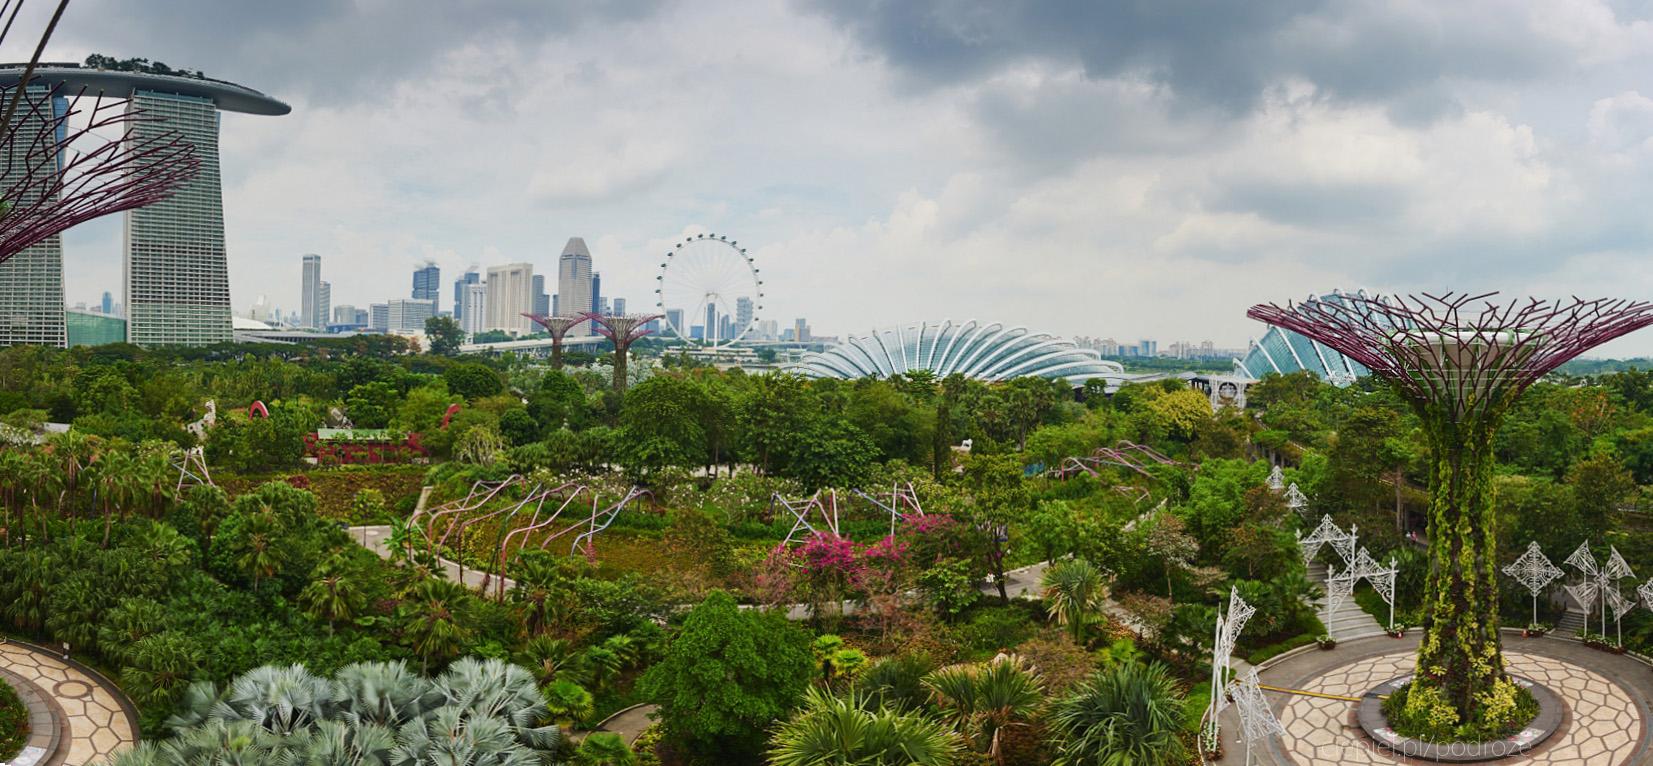 BezNazwy Panorama3 Singapur